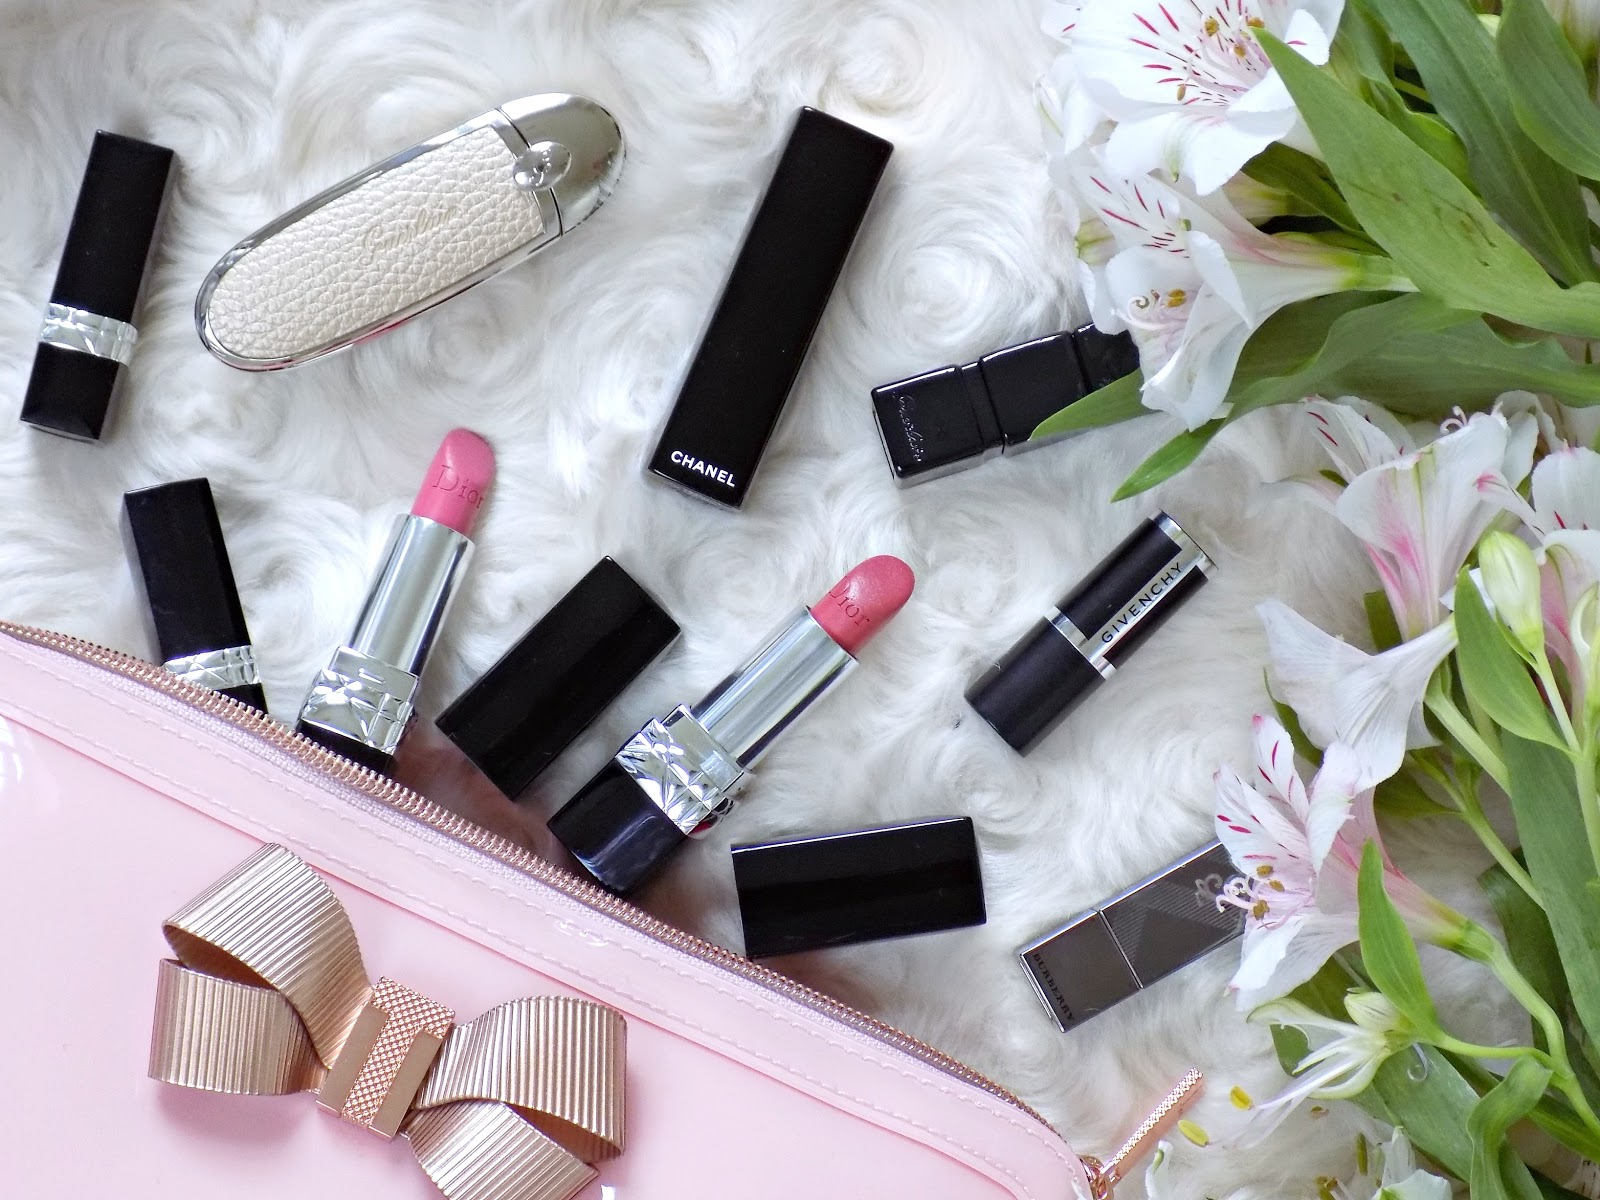 premium designer lipsticks, dior, chanel, guerlain